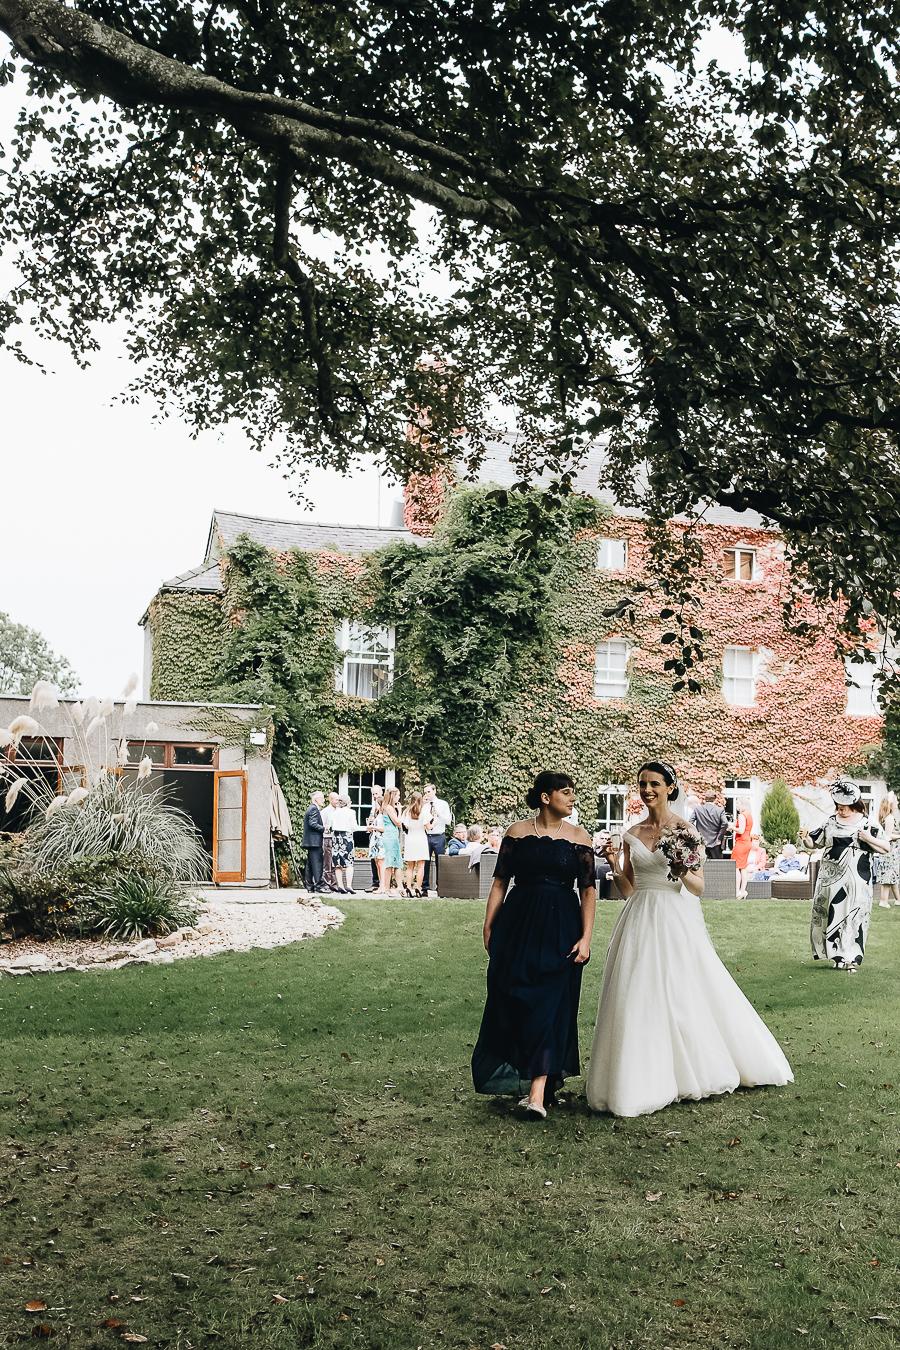 OurBeautifulAdventure-FairyhillWedding-John&Zoe-WeddingBlog-6668.jpg